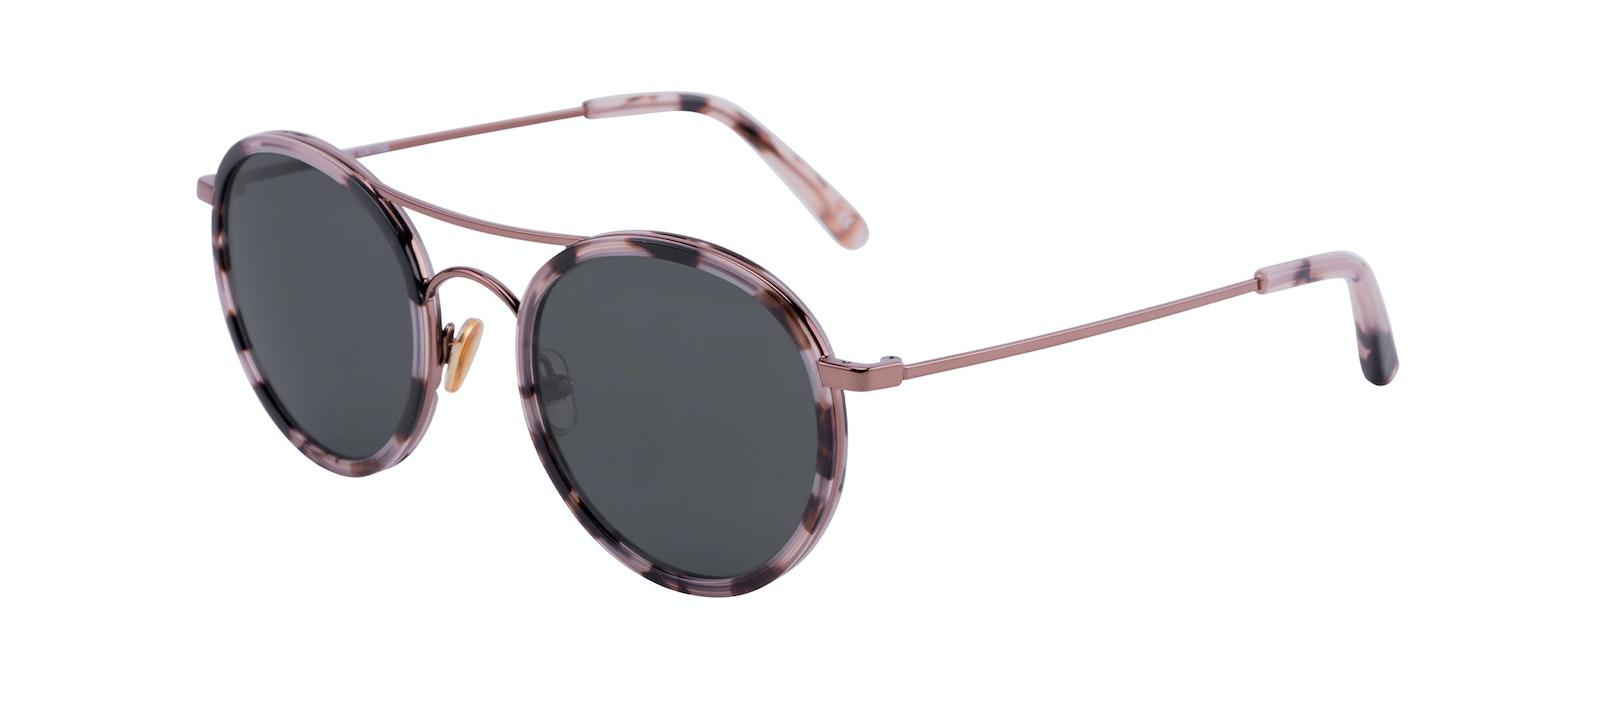 Affordable Fashion Glasses Aviator Round Sunglasses Women Dawn Pink Tortoise Tilt